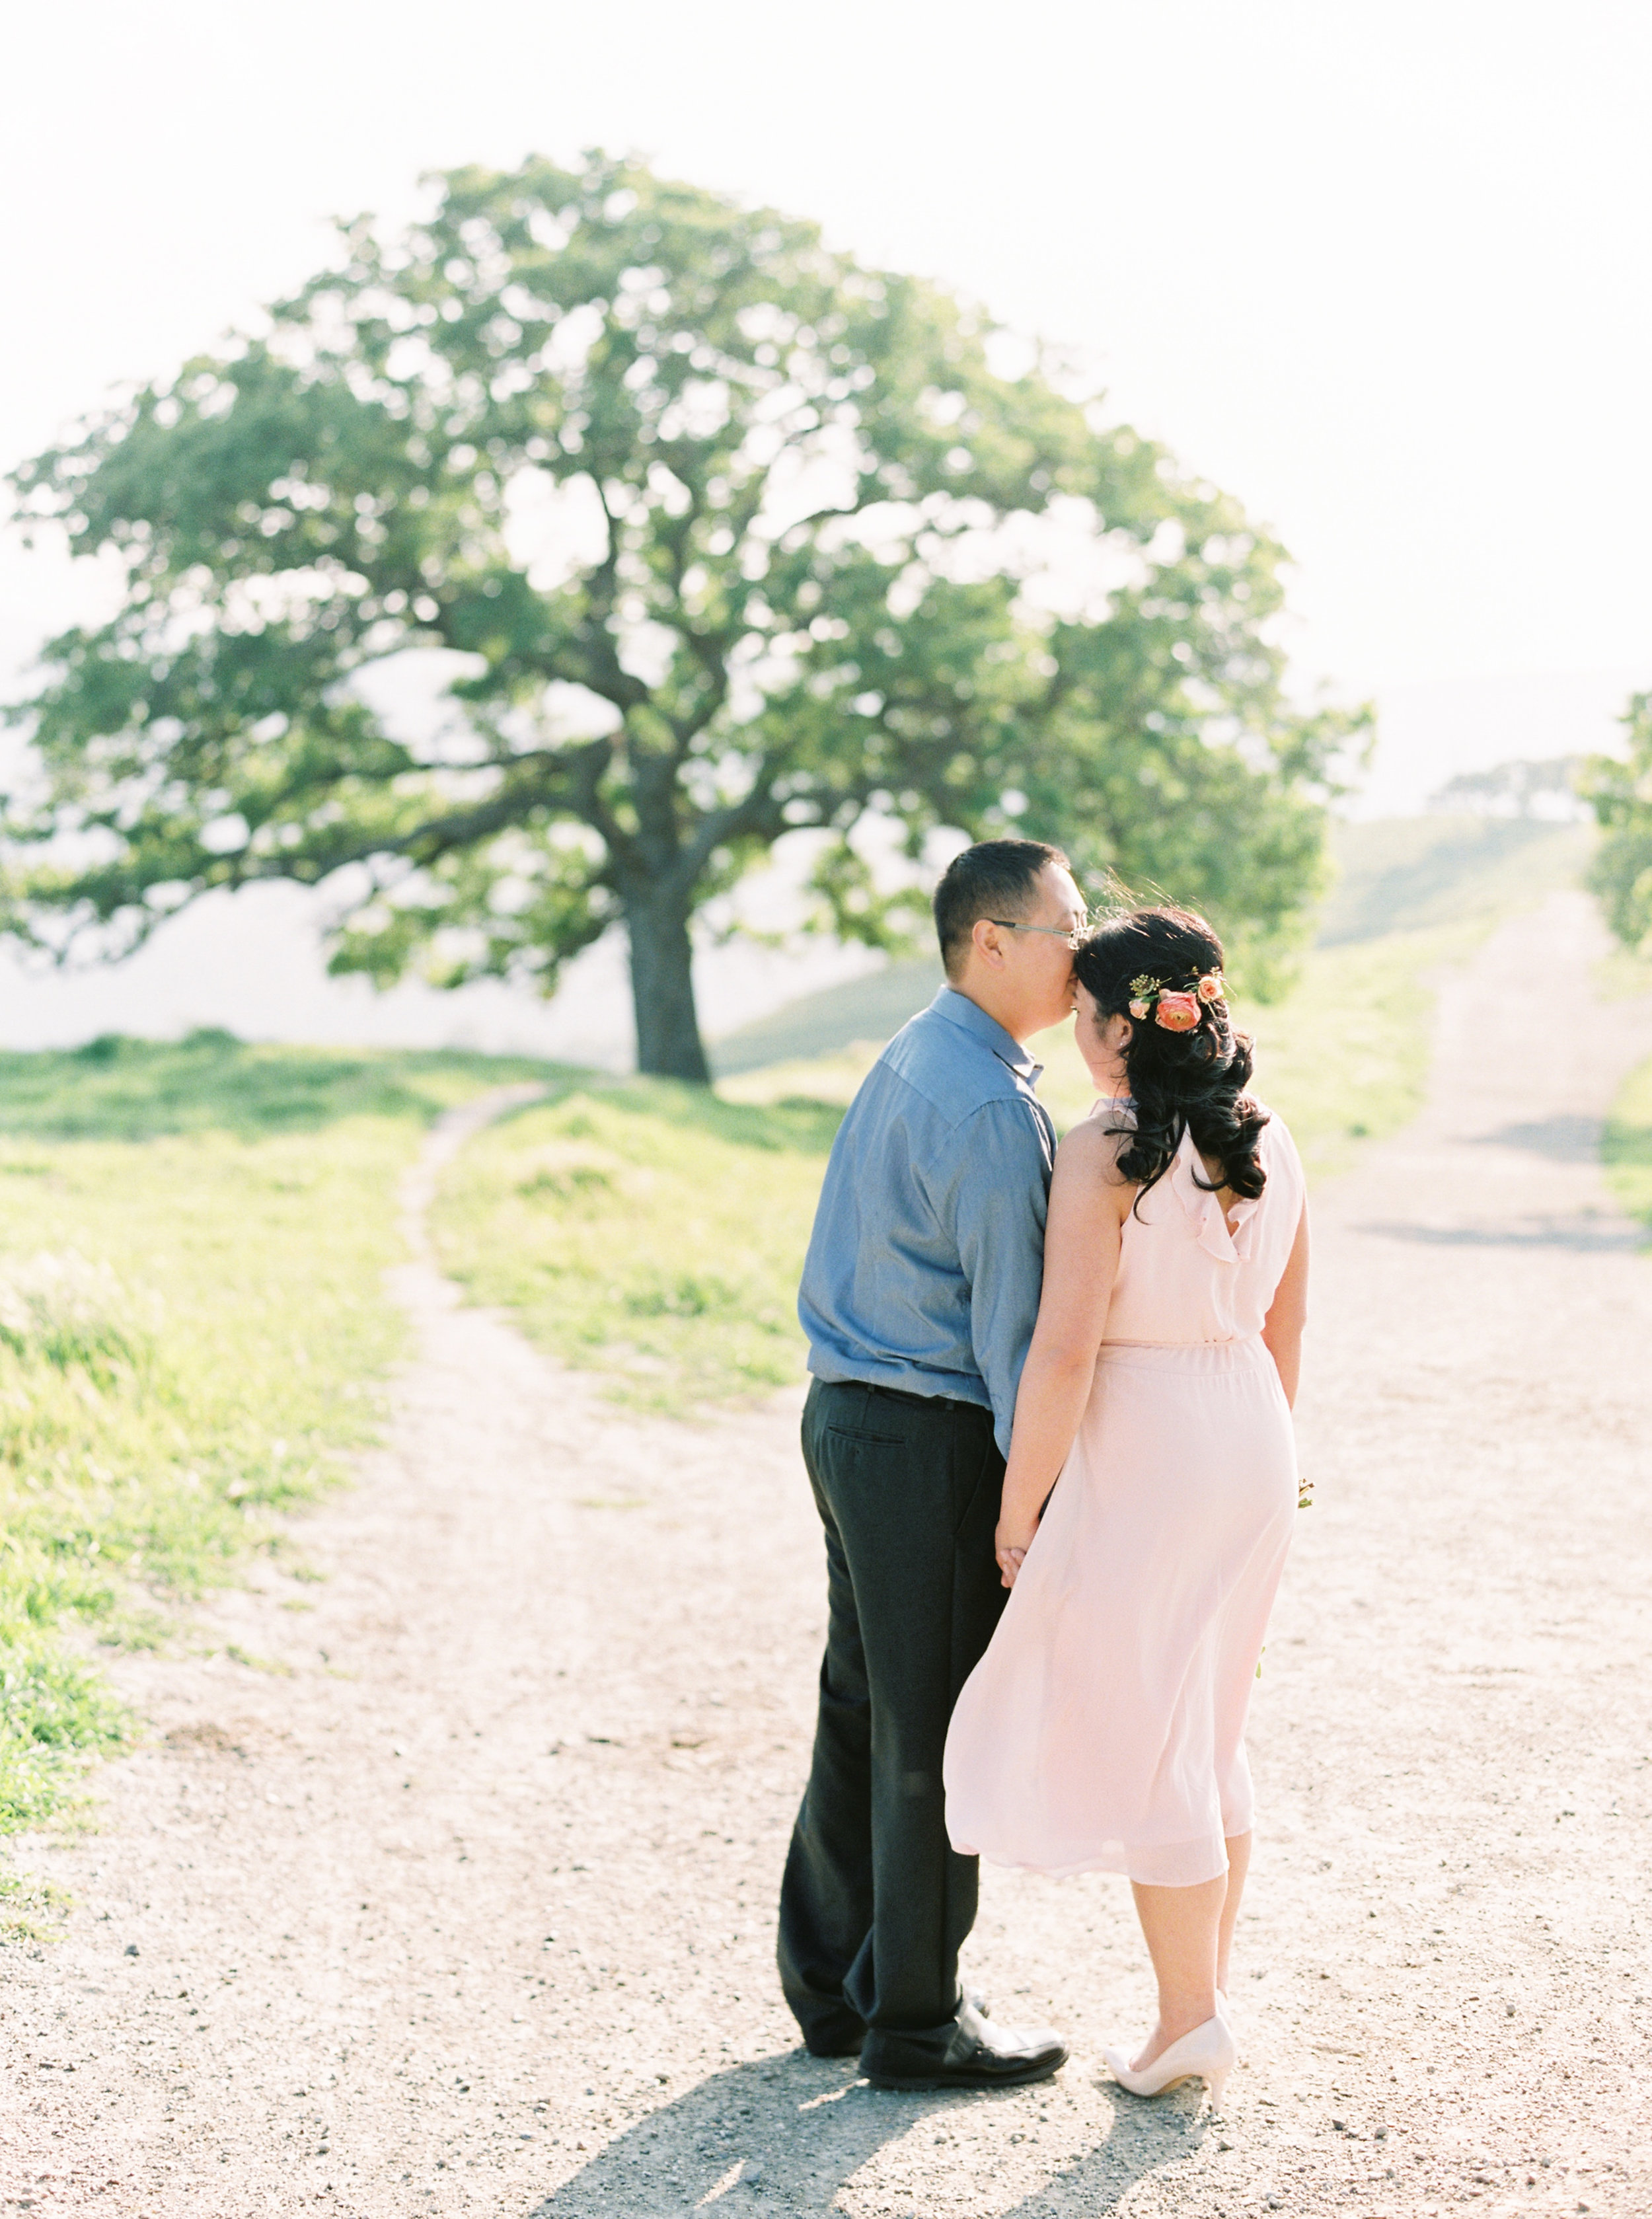 del-valle-livermore-bay-area-wedding-photographer-78.jpg